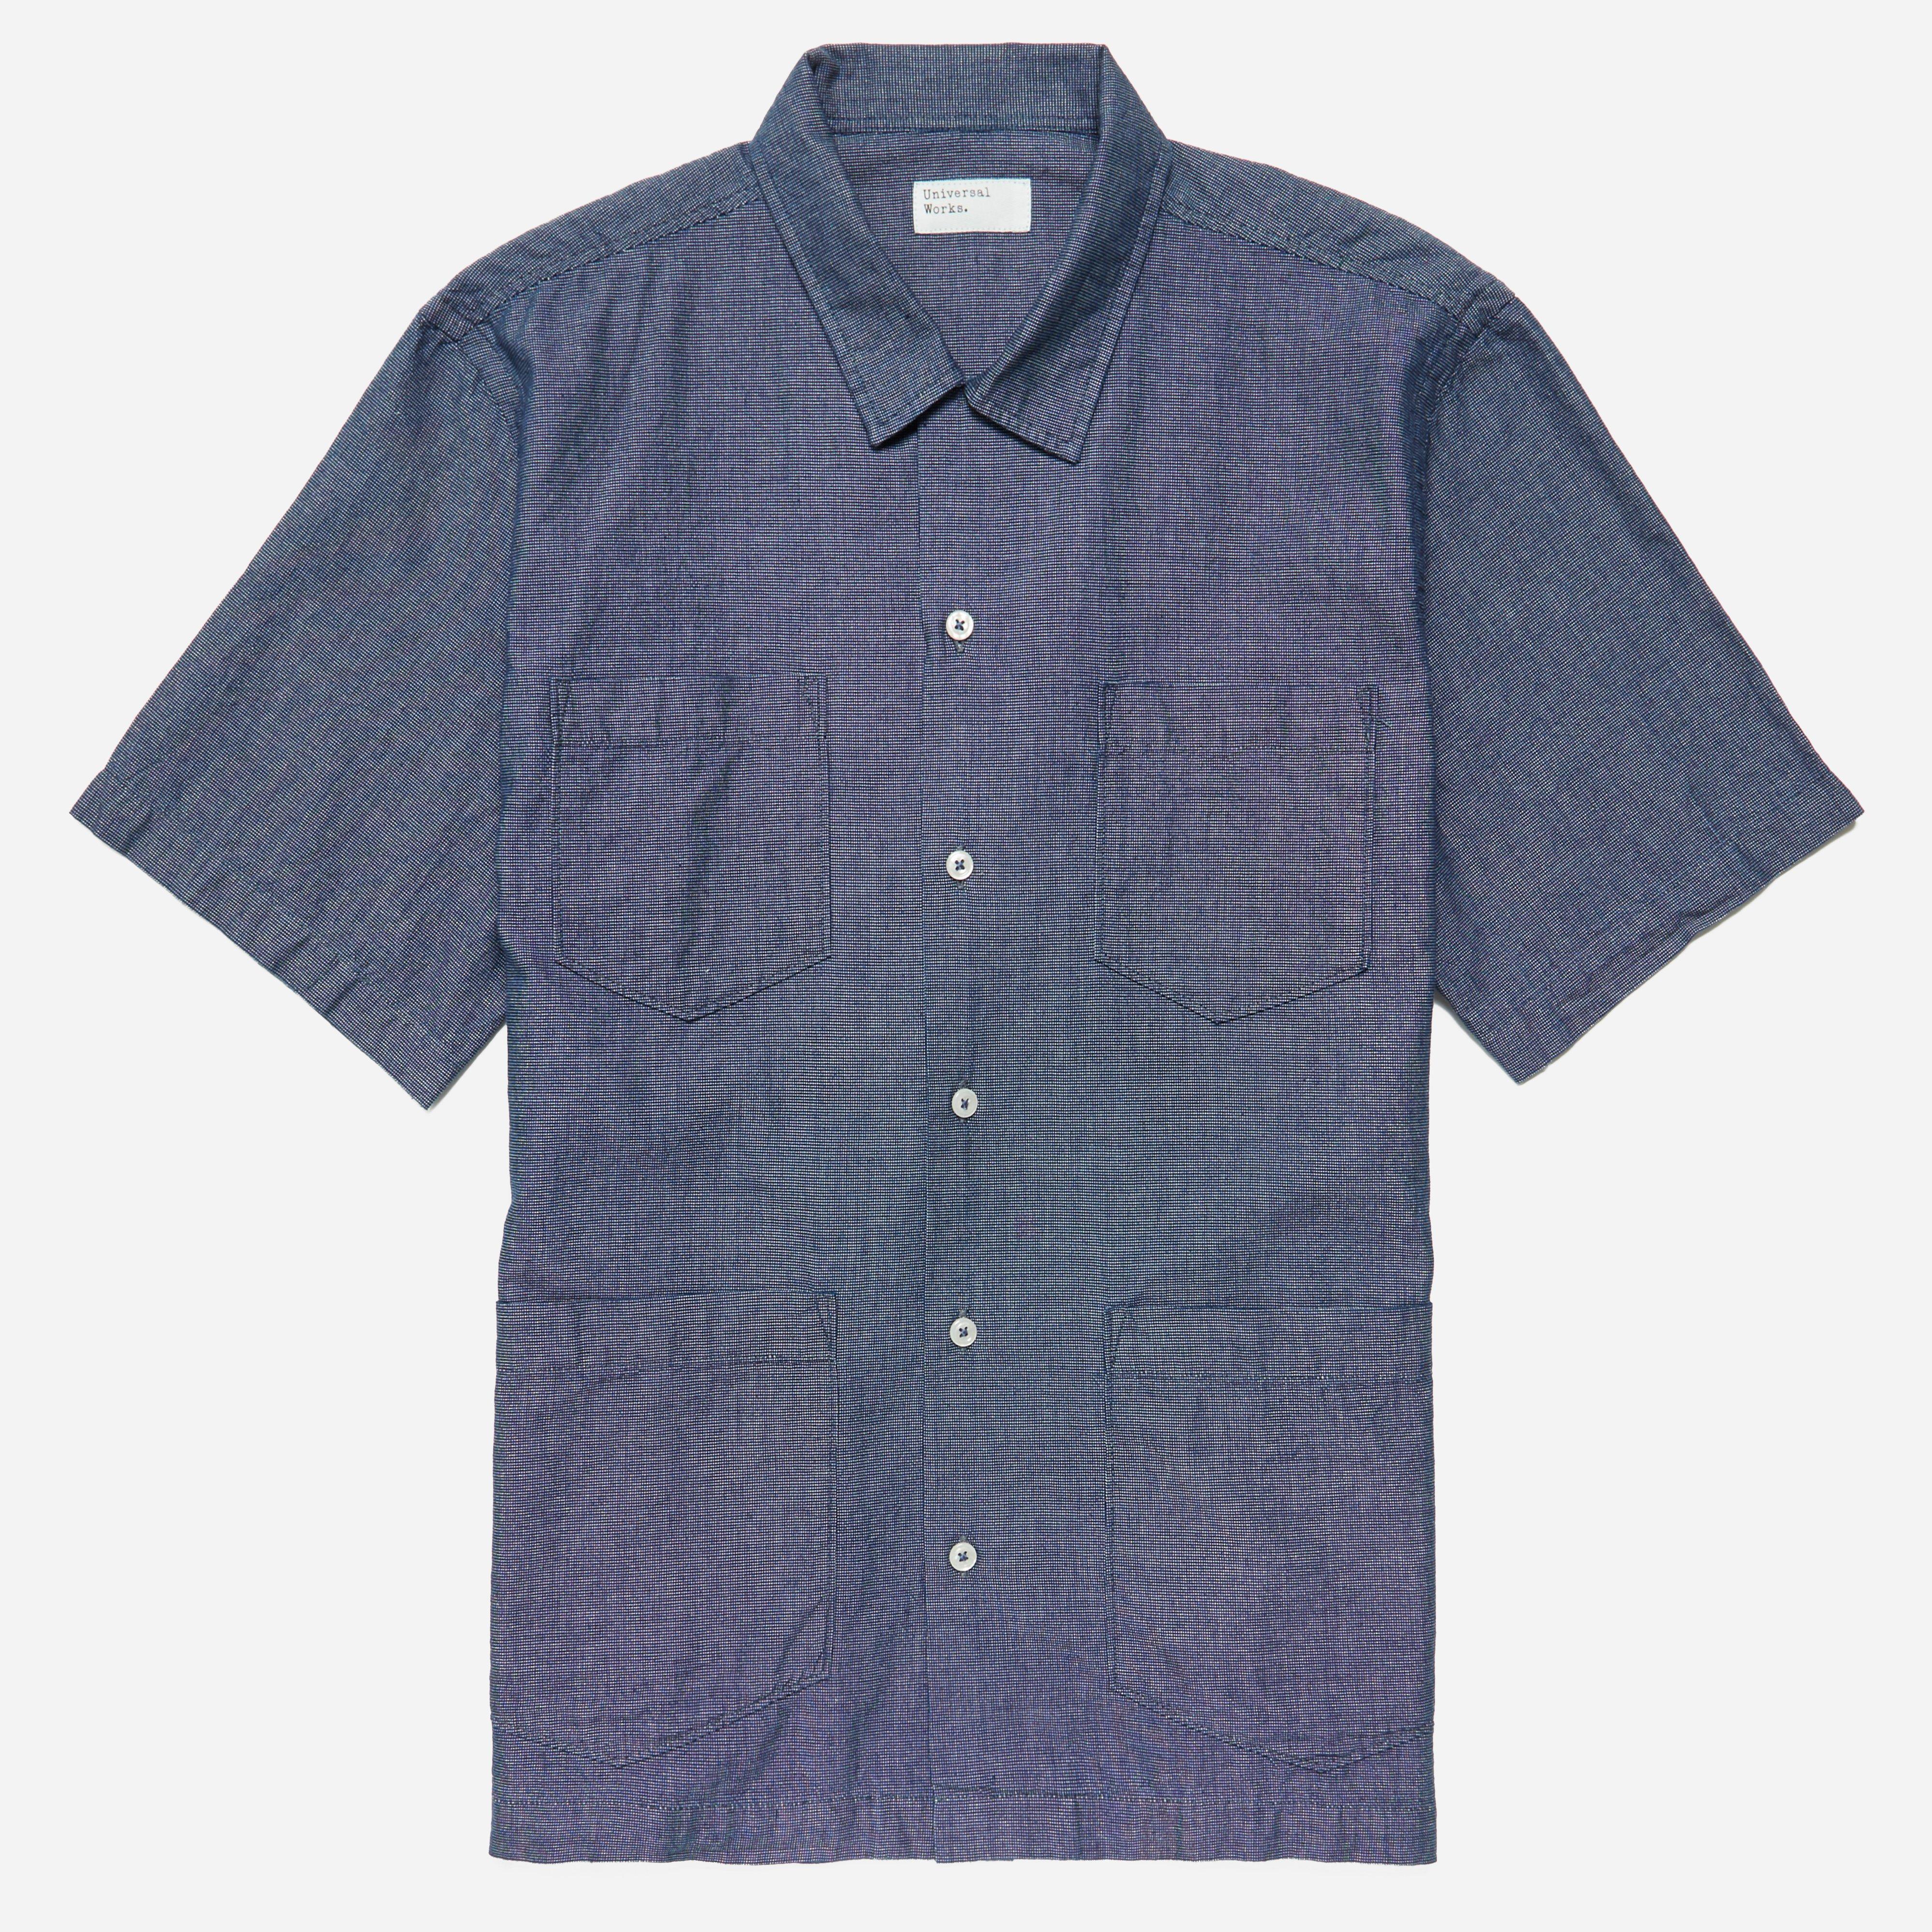 Universal Works Camp-collar Printed Cotton Shirt - Navy OENdy19I